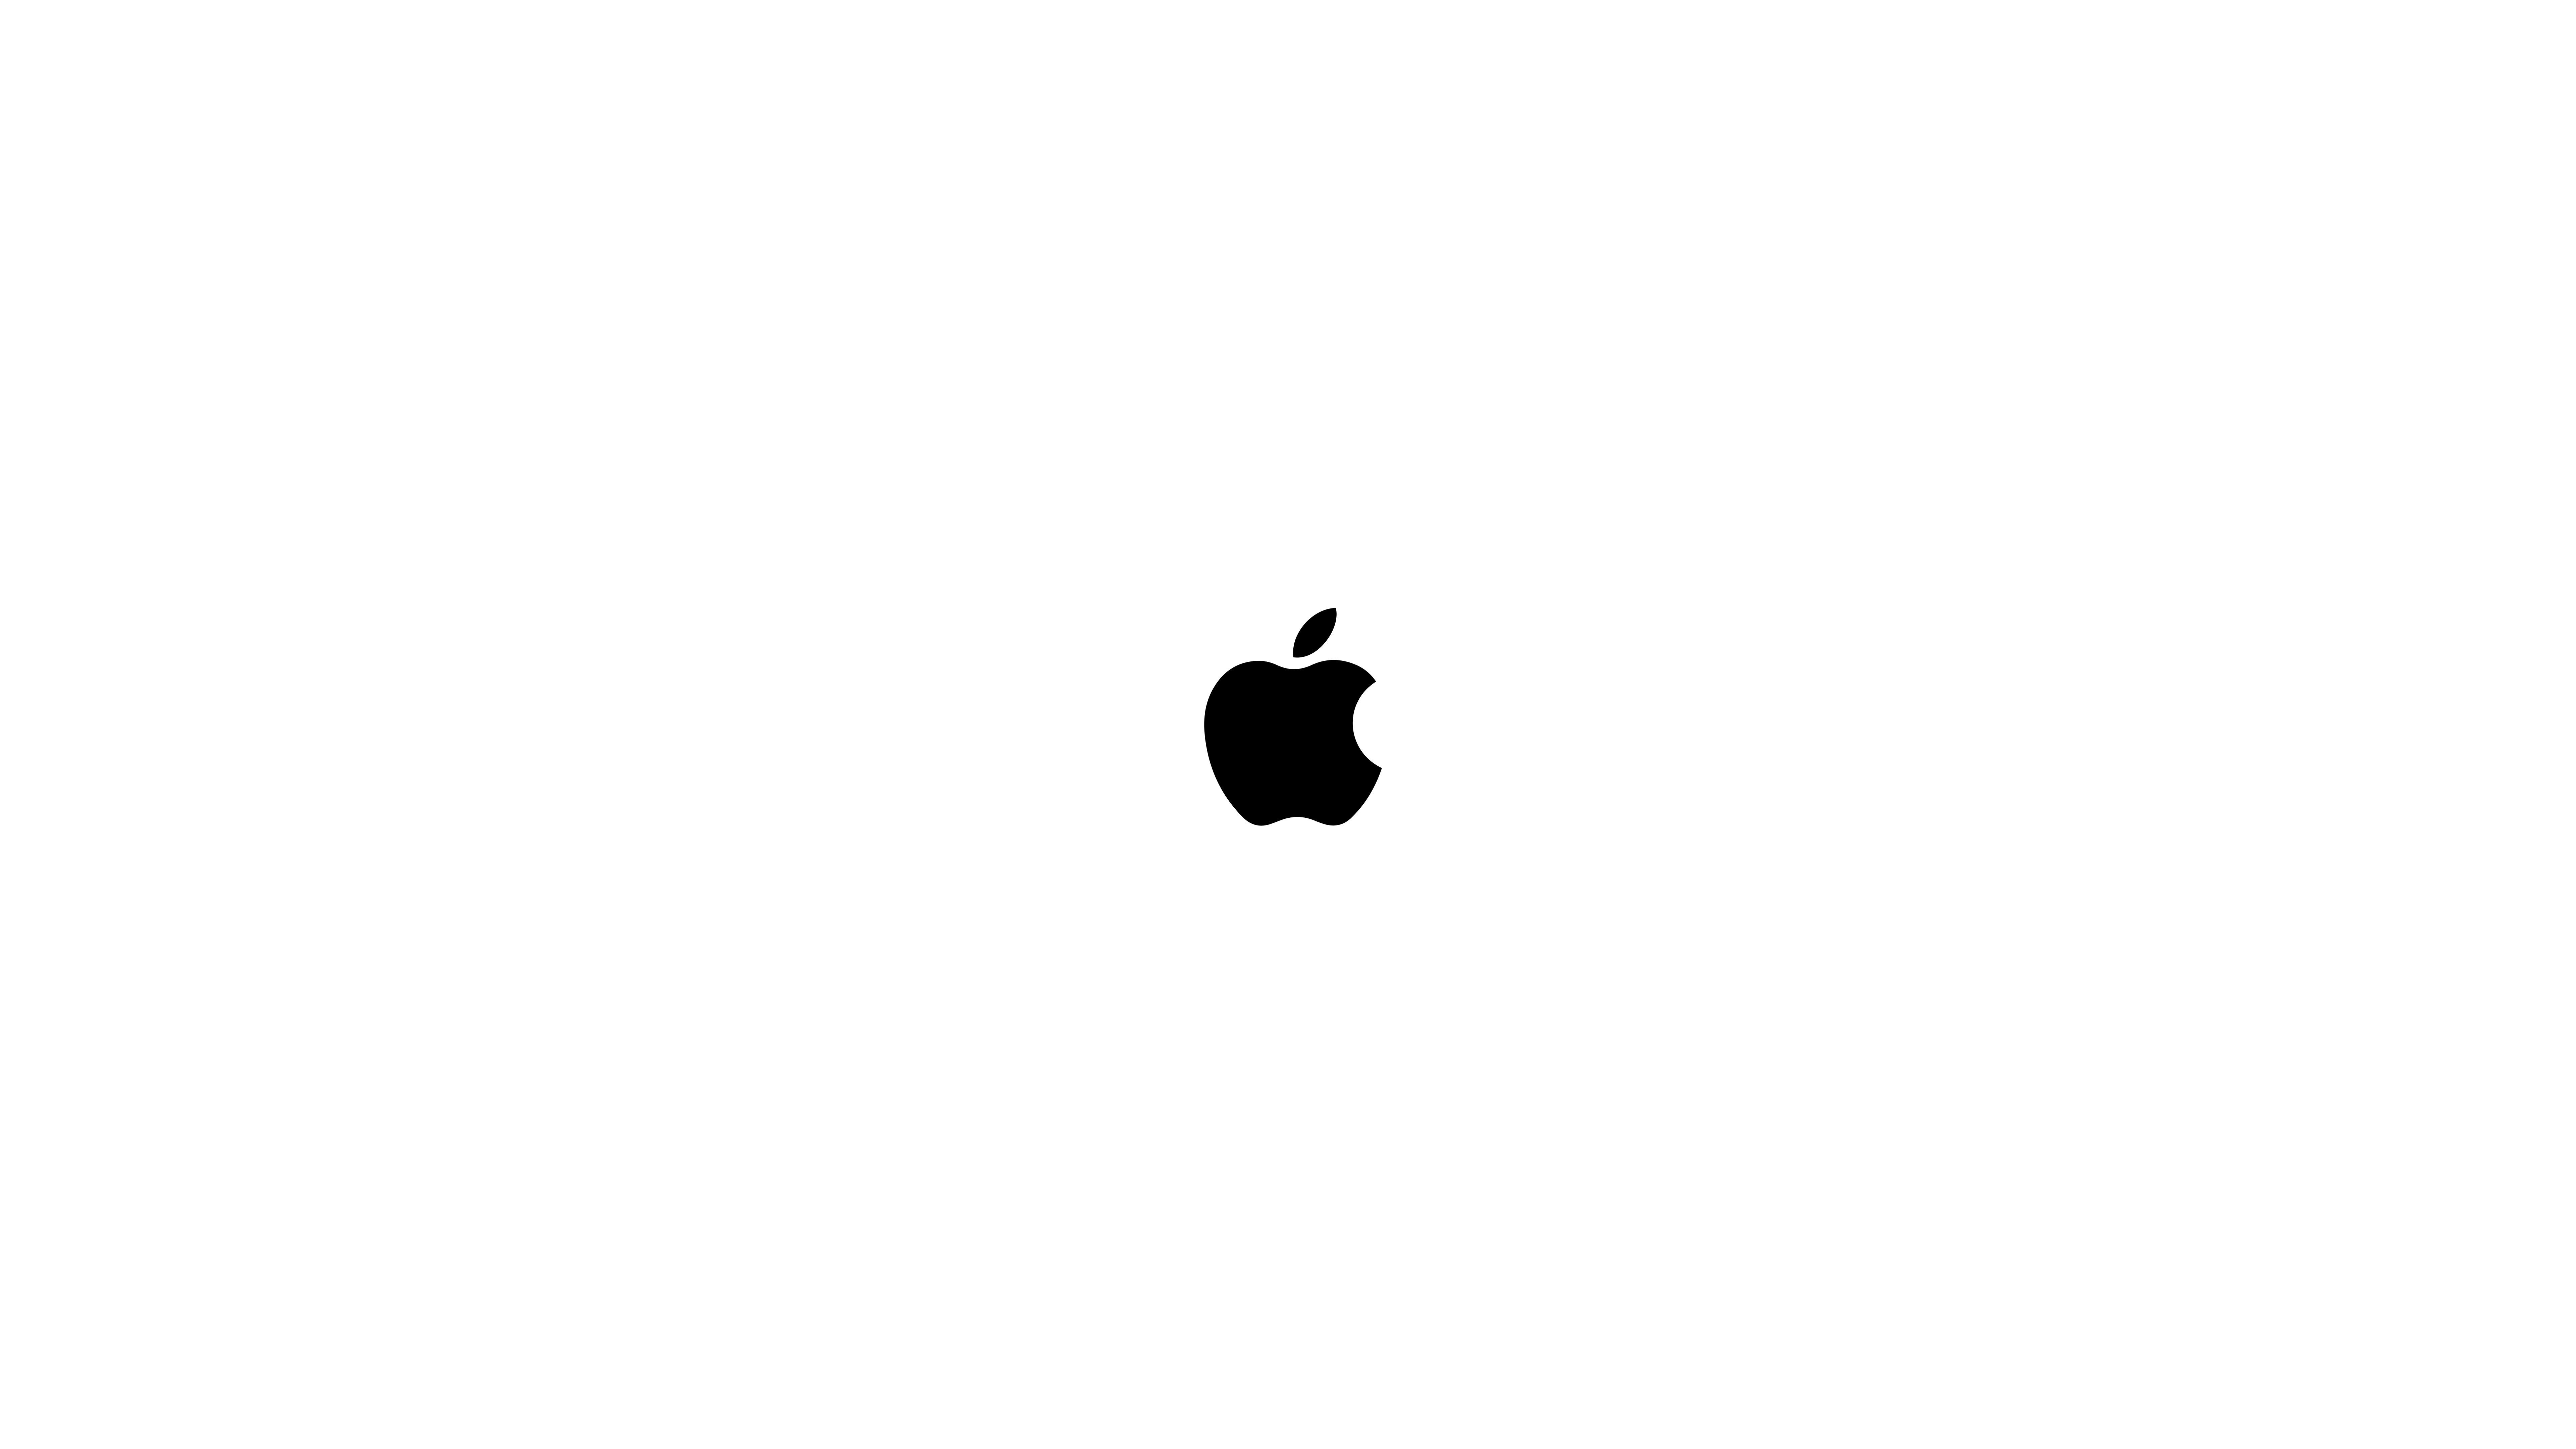 Iphone 5 Space Wallpaper Hd Black Apple Logo Uhd 8k Wallpaper Pixelz